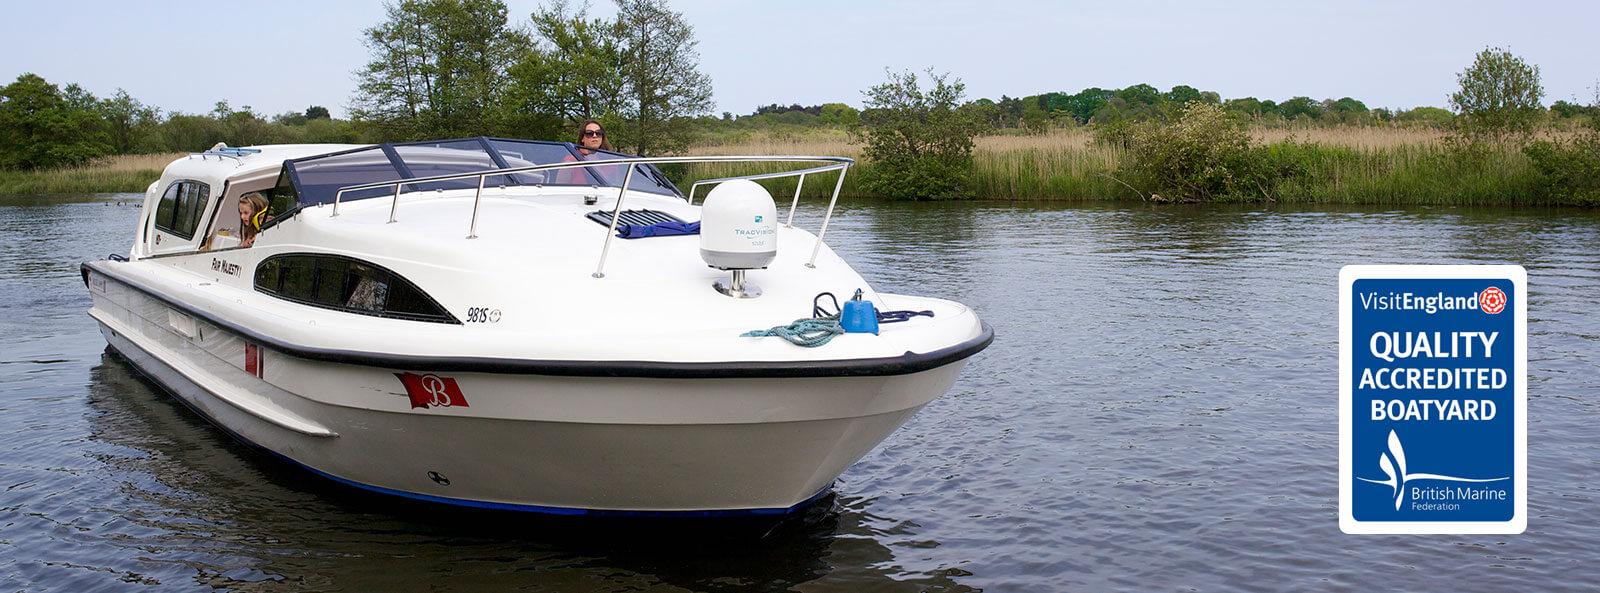 Luxury Boating Holidays In The UK